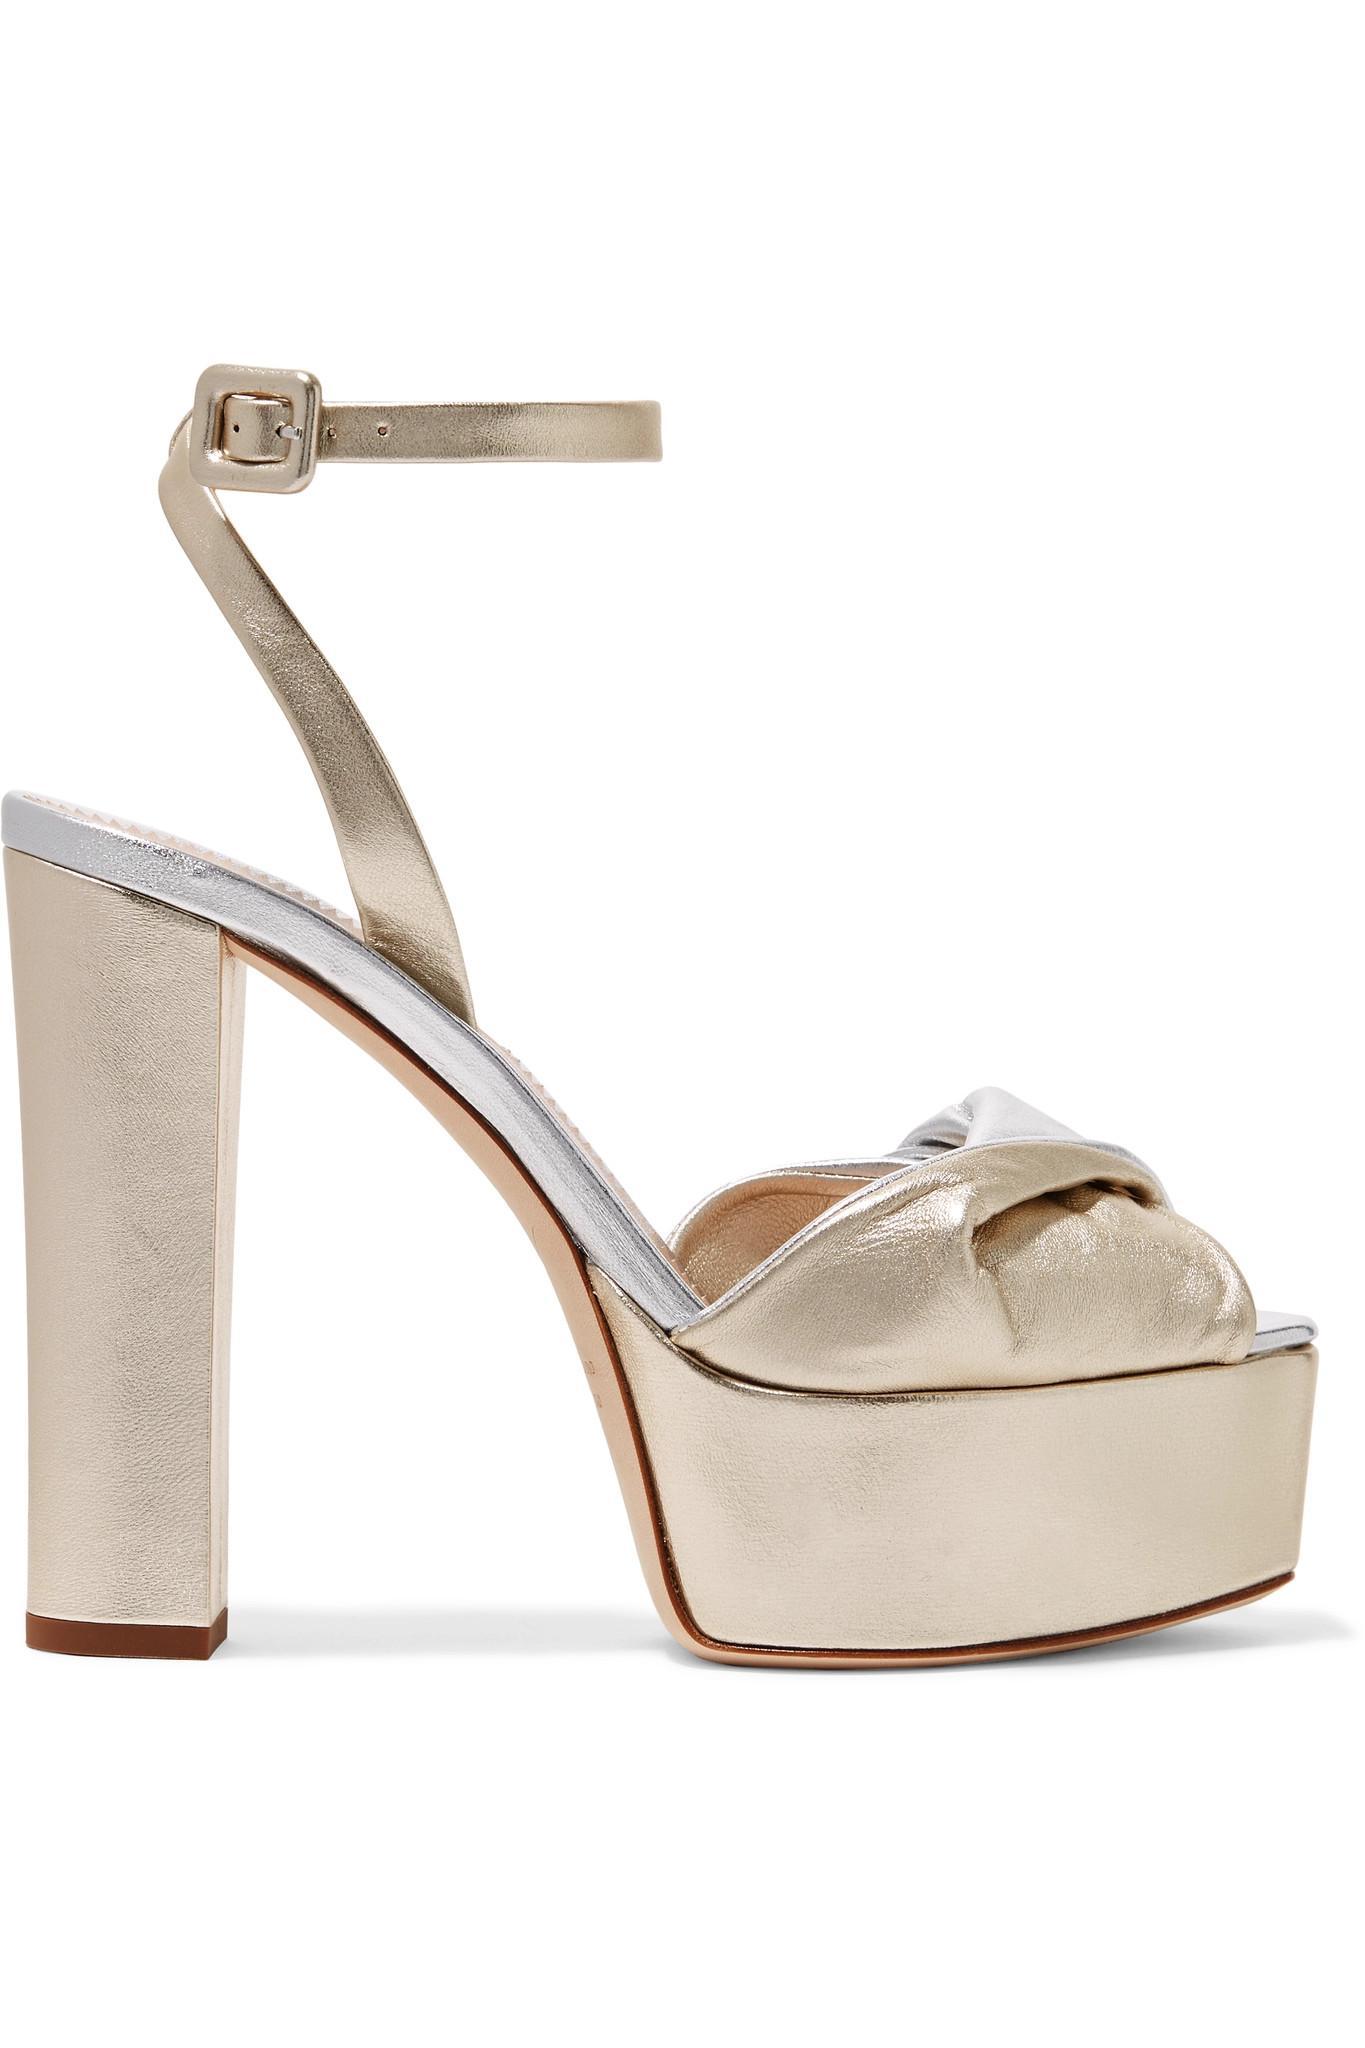 d1de0f70241 Giuseppe Zanotti. Women s Lavinia Metallic Leather Platform Sandals